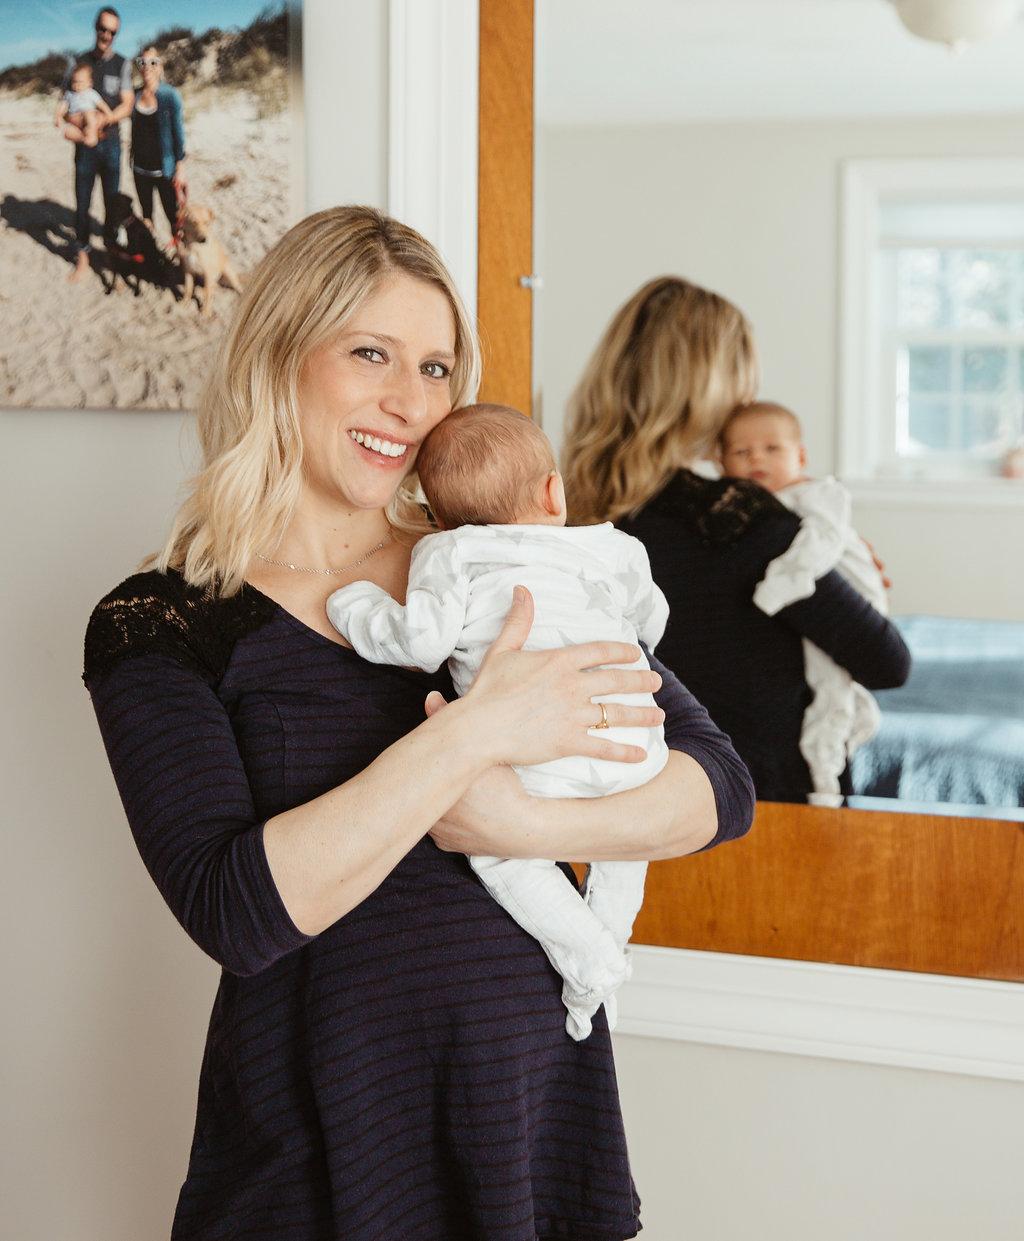 Mother and newborn baby during Sudbury Massachusetts photo session